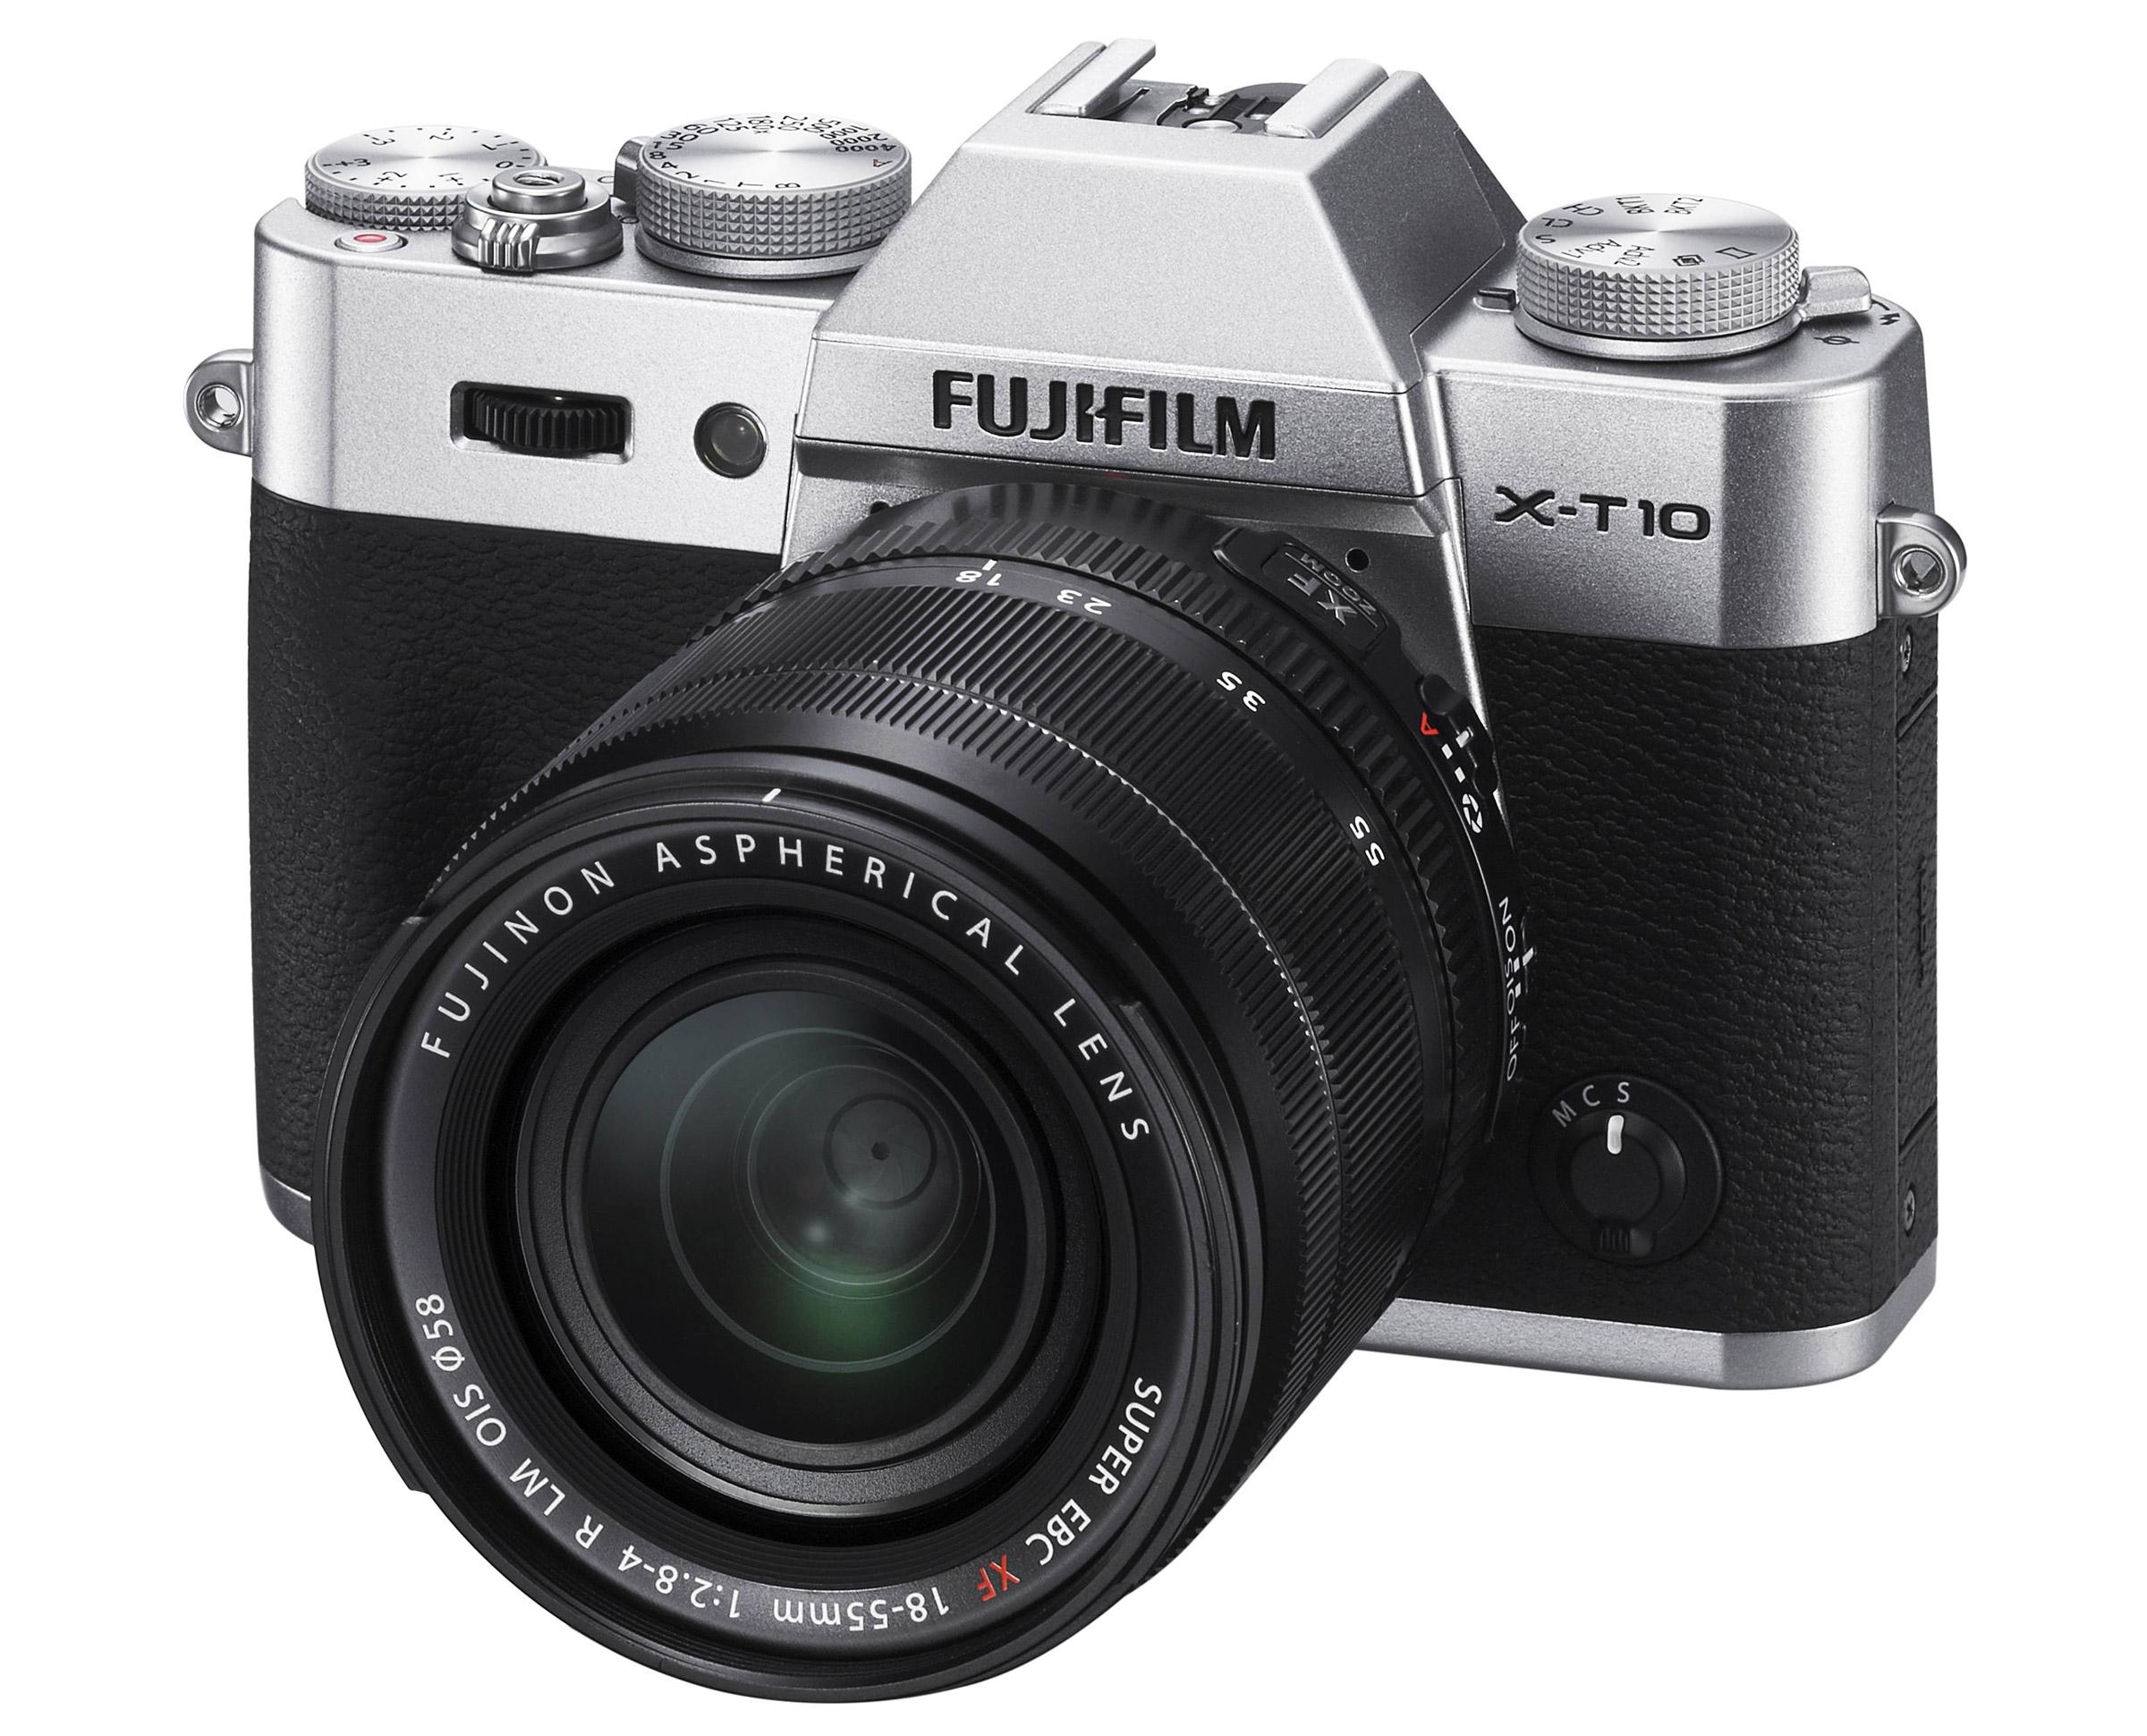 Image result for FUJIFILM X-T10